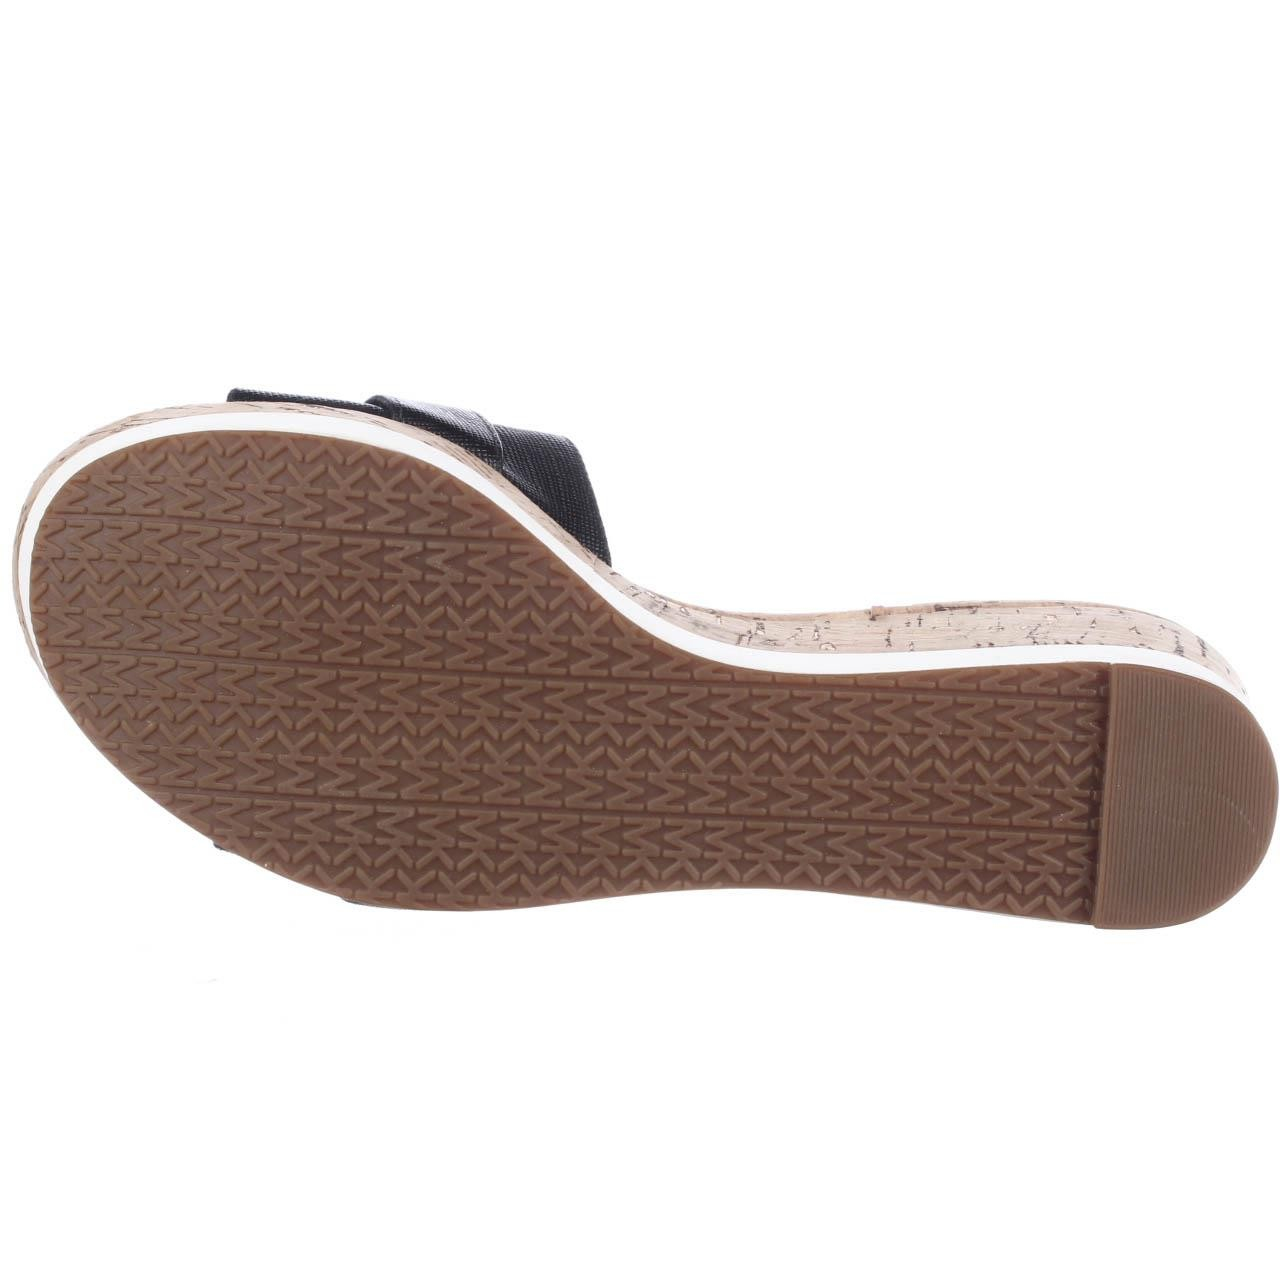 Lyst Michael Kors Michael Warren Platform Slide Sandals